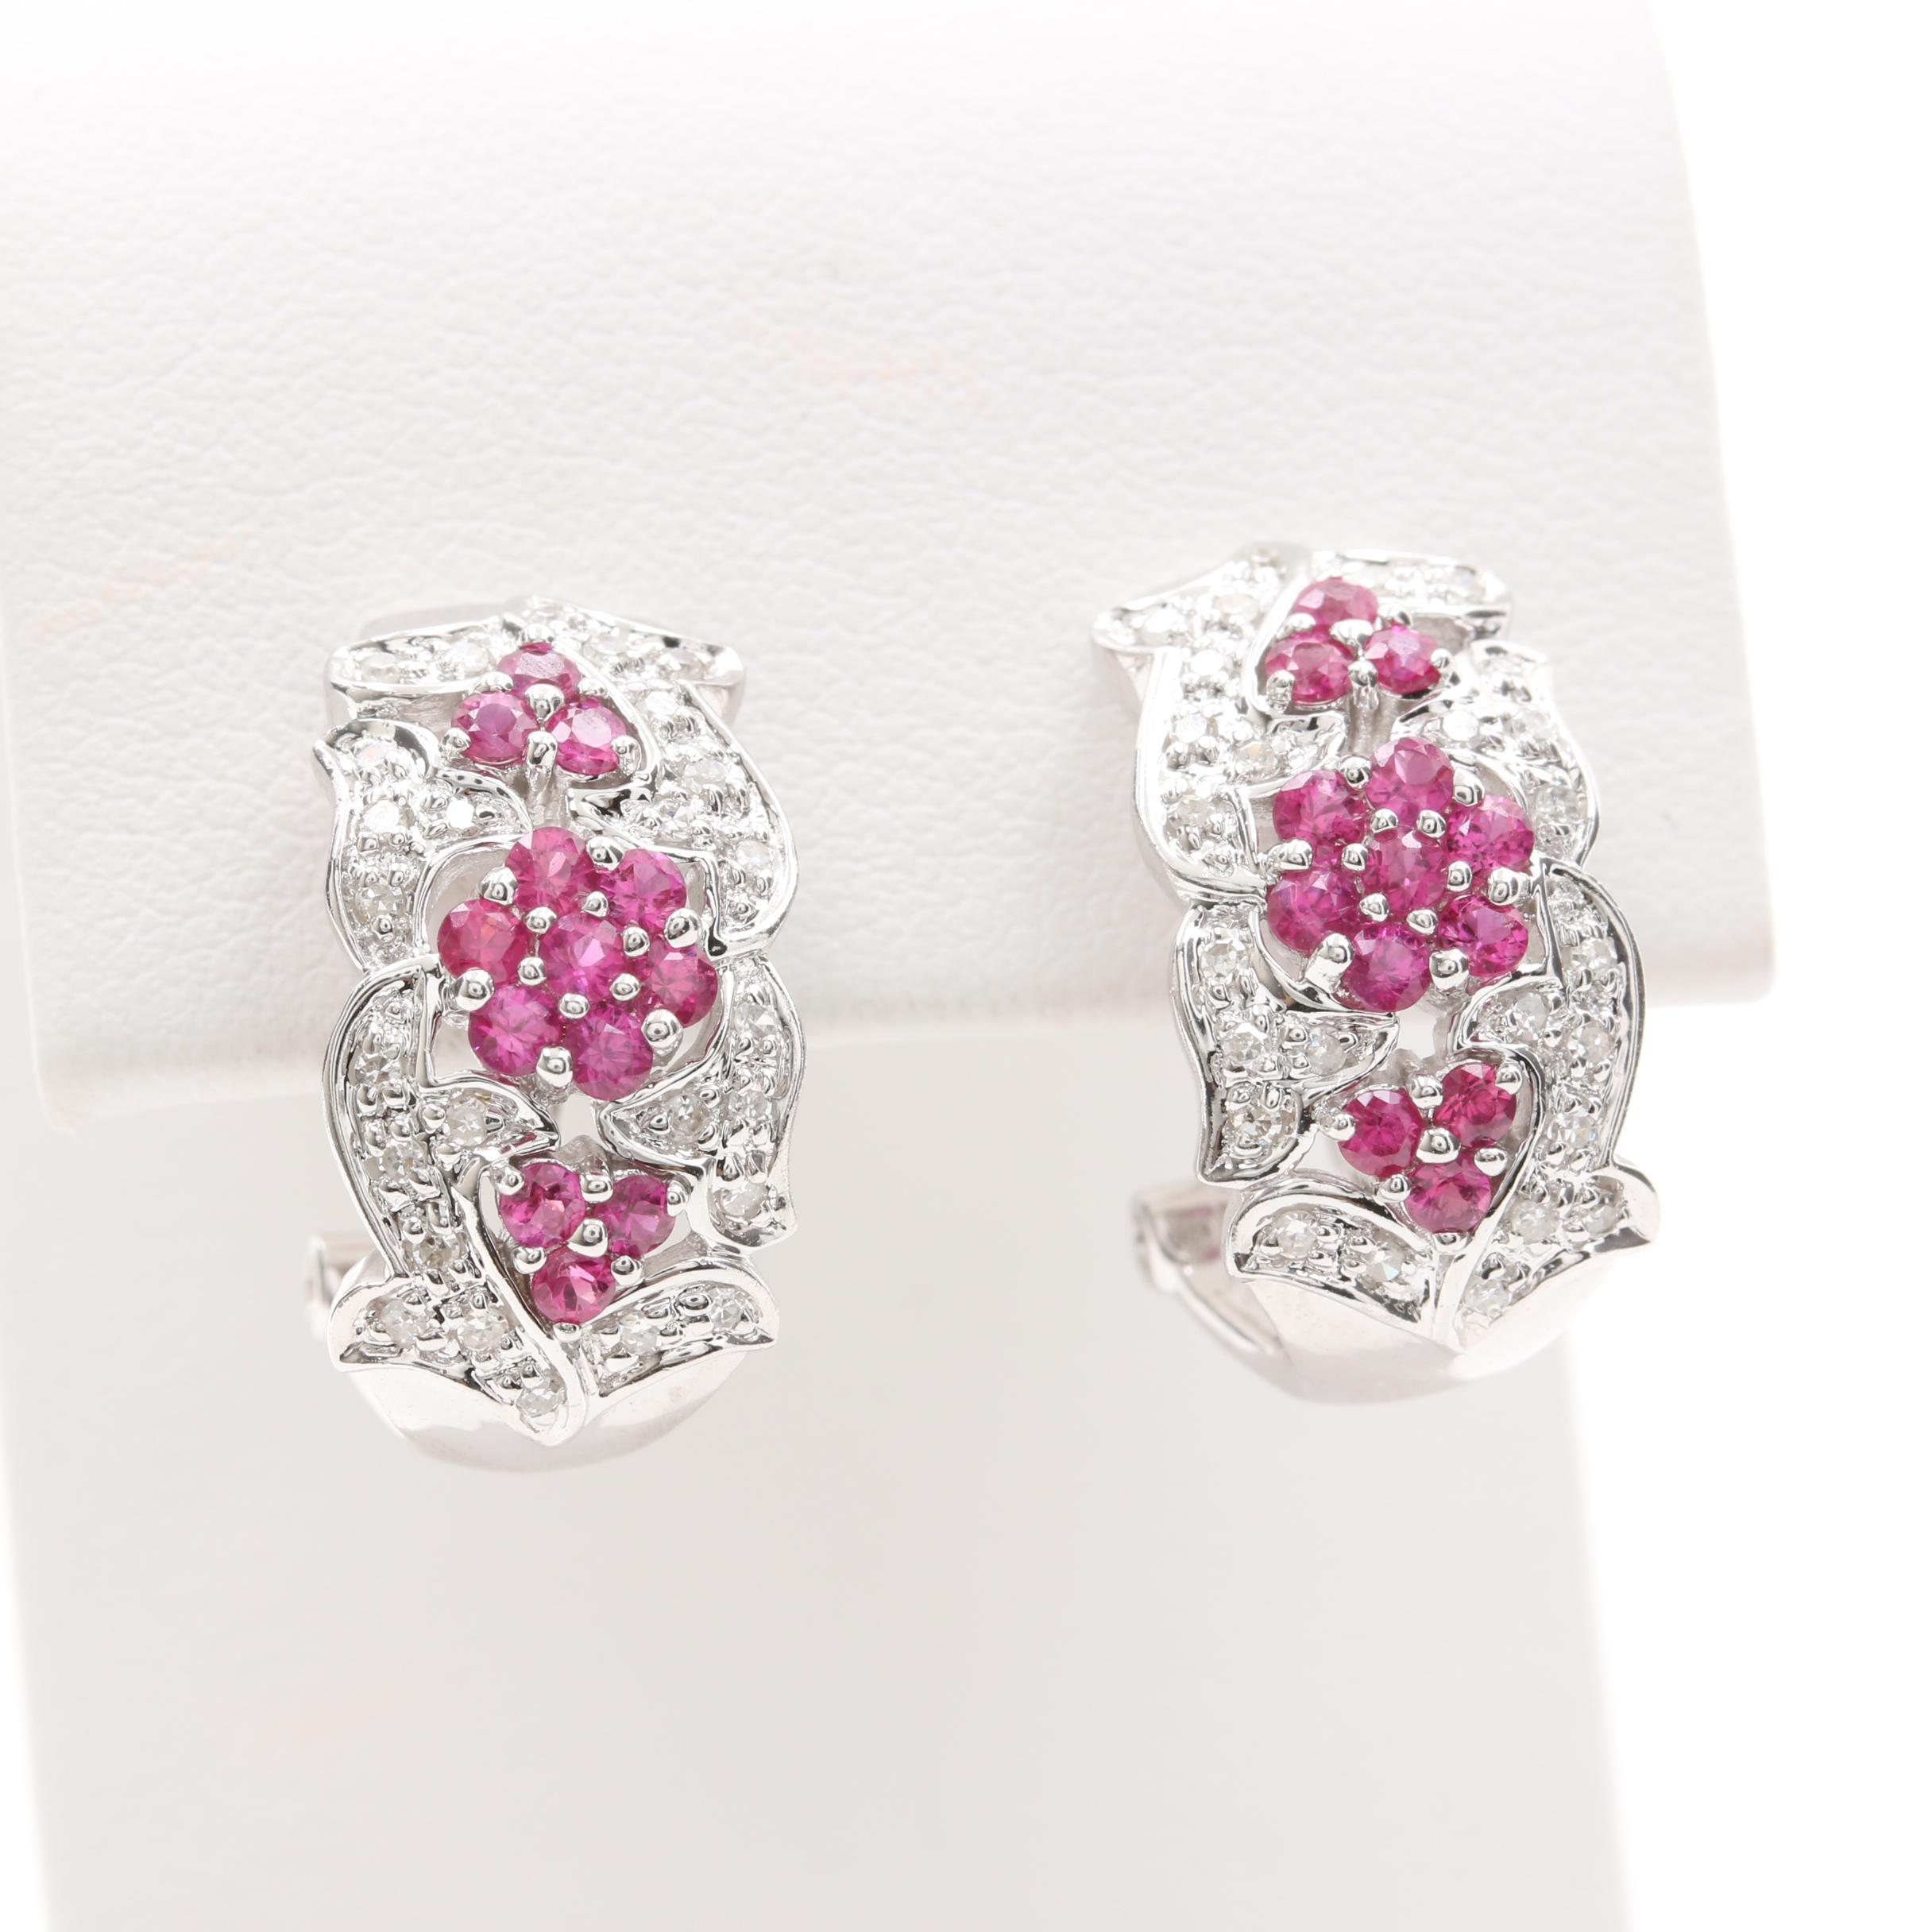 14K White Gold Ruby and Diamond Earrings